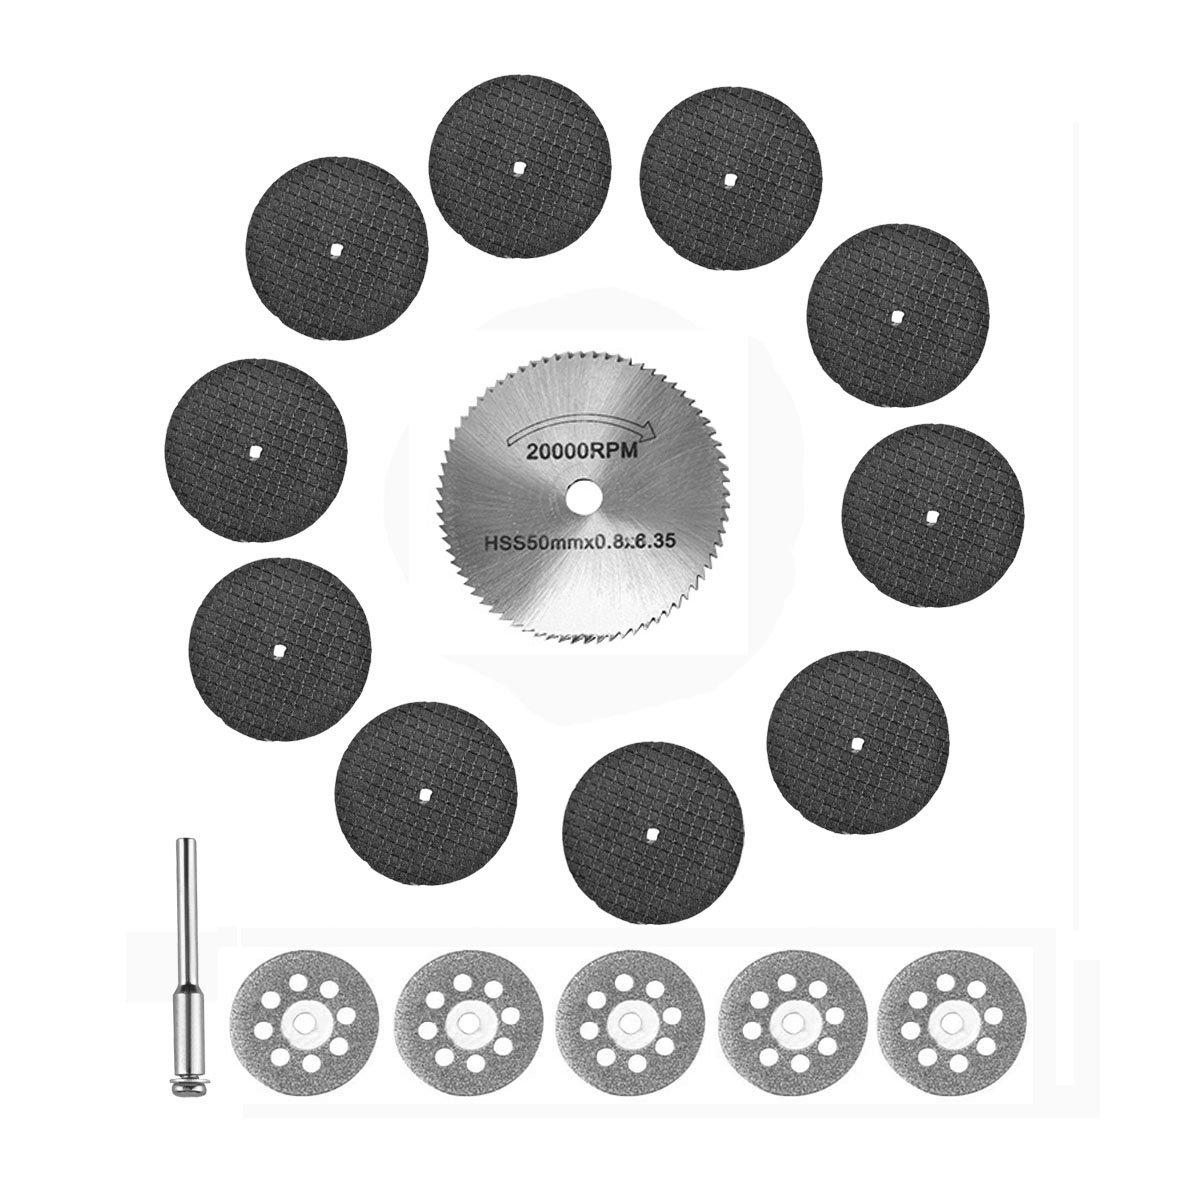 50mm Diamond Cutting Glass Discs Wheel Fashion For Power Drill Craft Rotary Tool